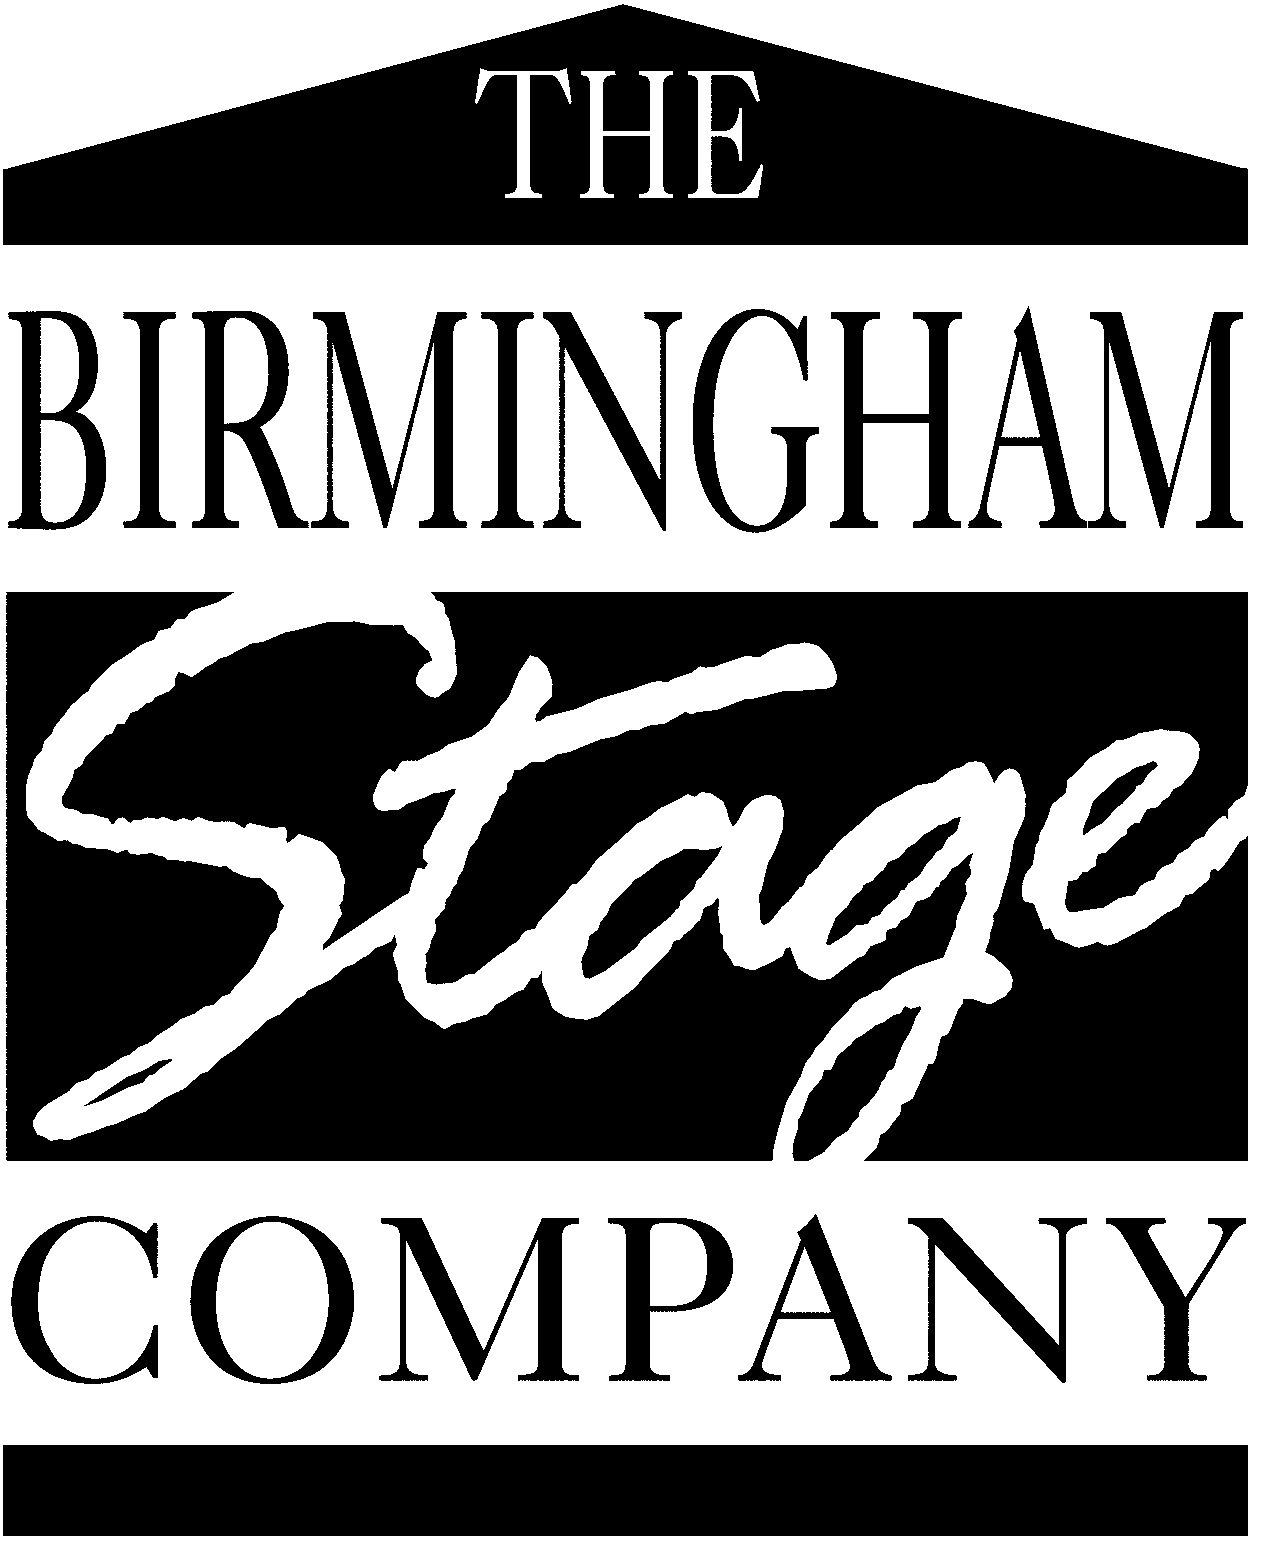 Birmingham stage company logo jpeg